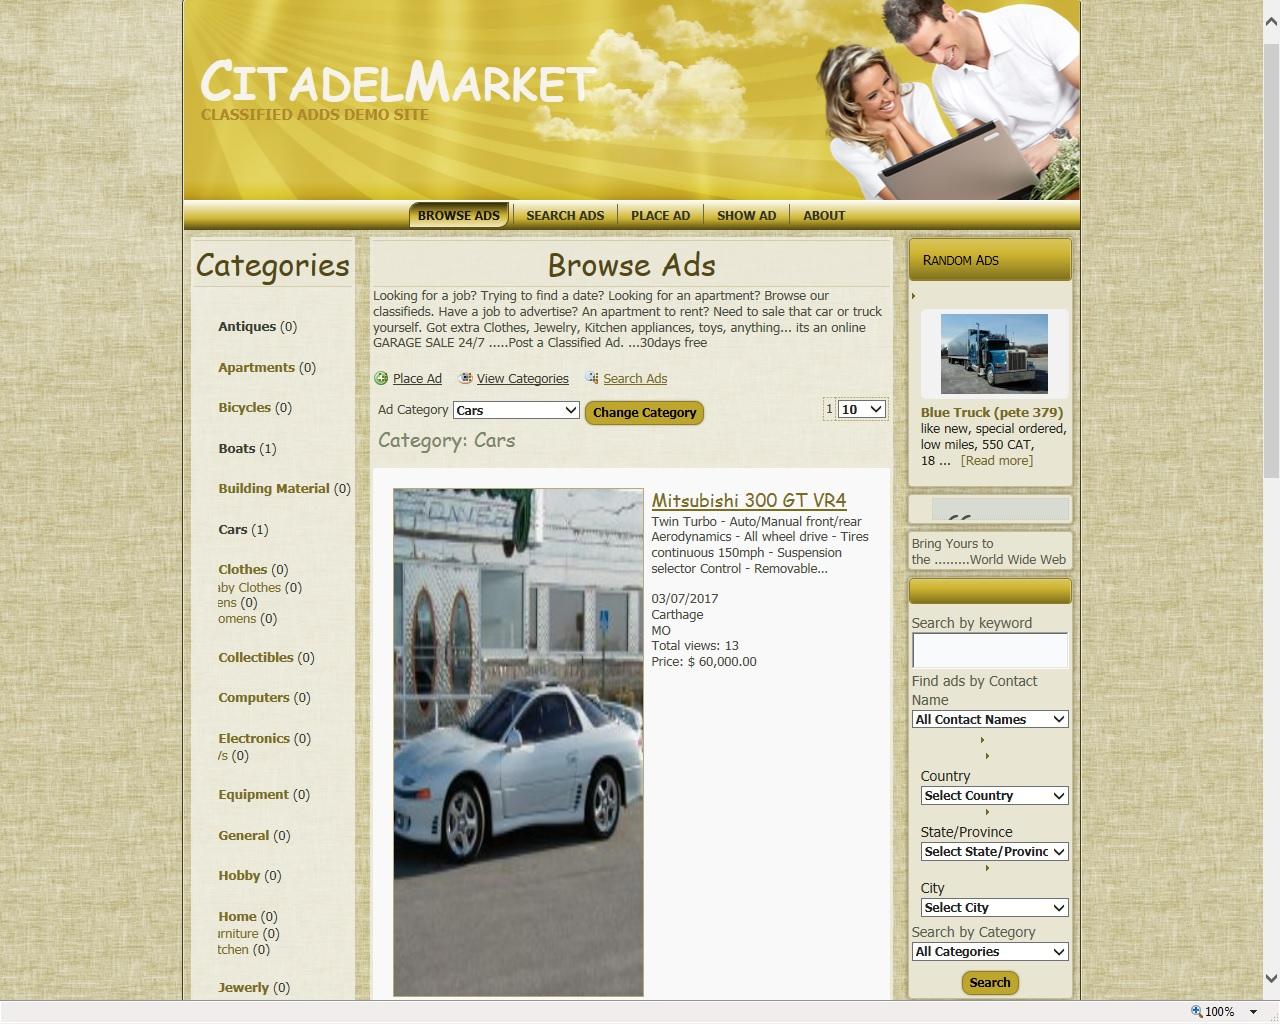 Citadelmarket Classified Ads Website